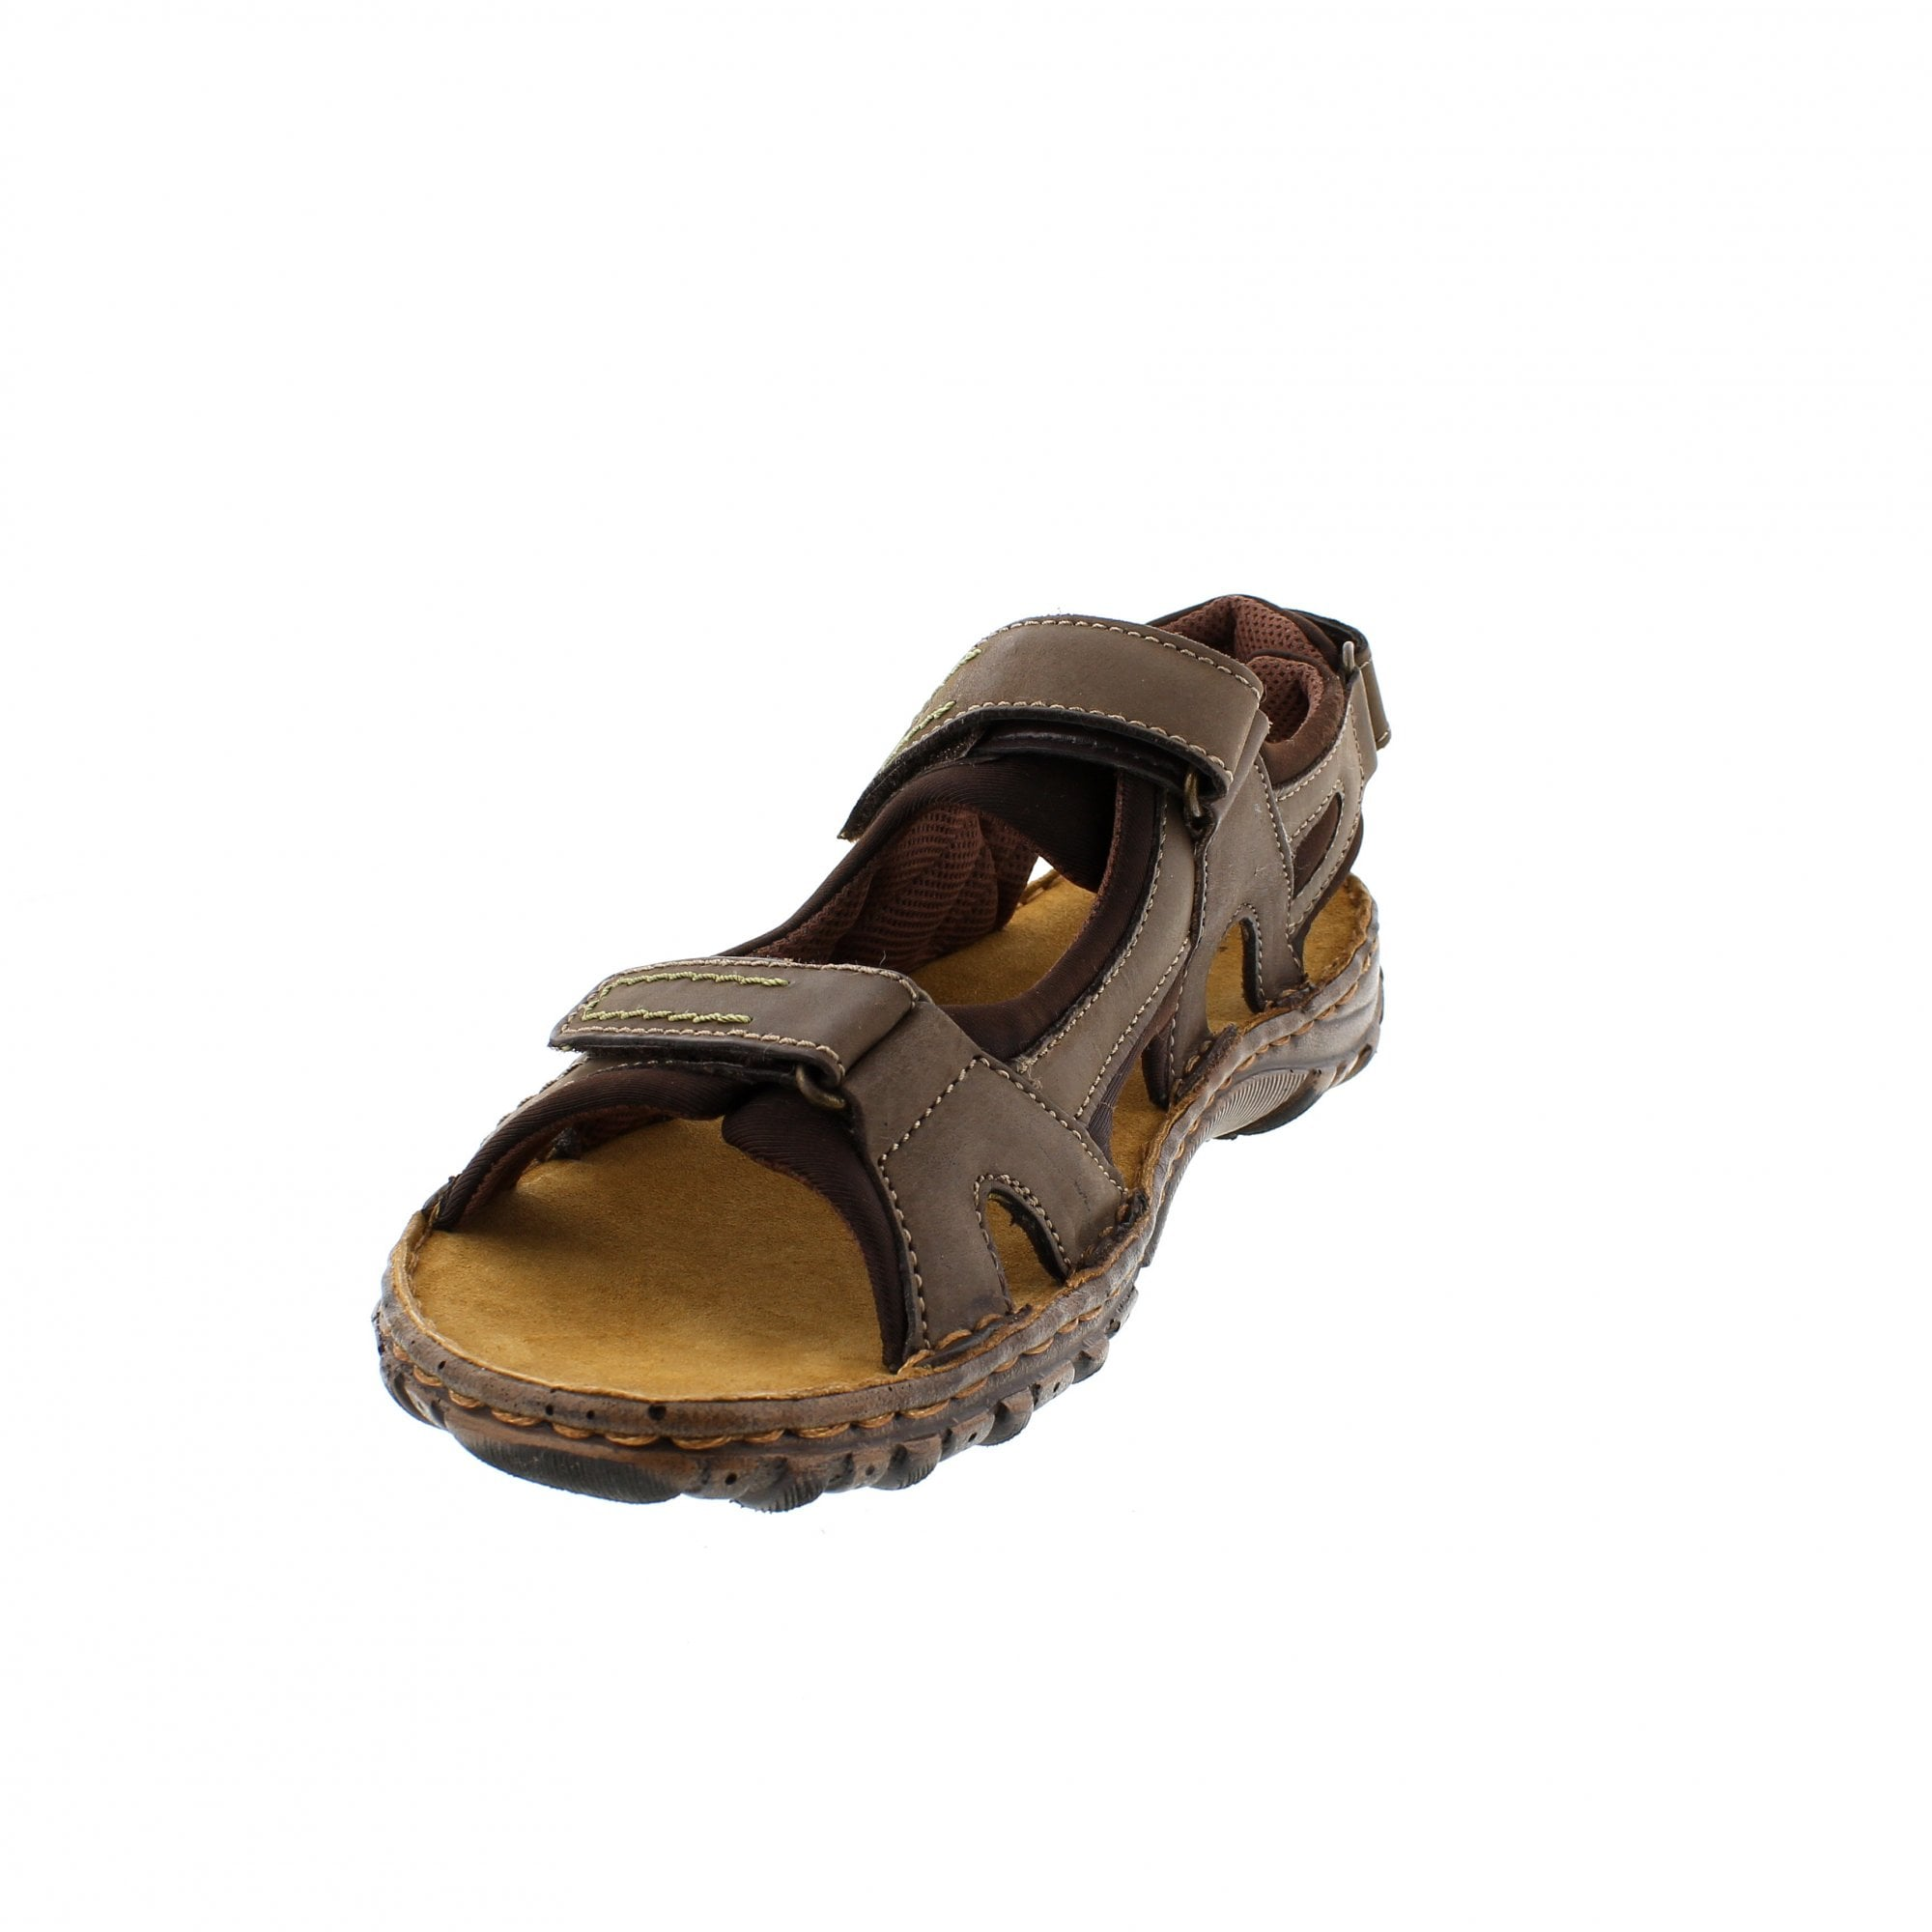 e502368bf6b4d6 Josef Seibel Cardiff 08 36492-946330 Mens Sandals